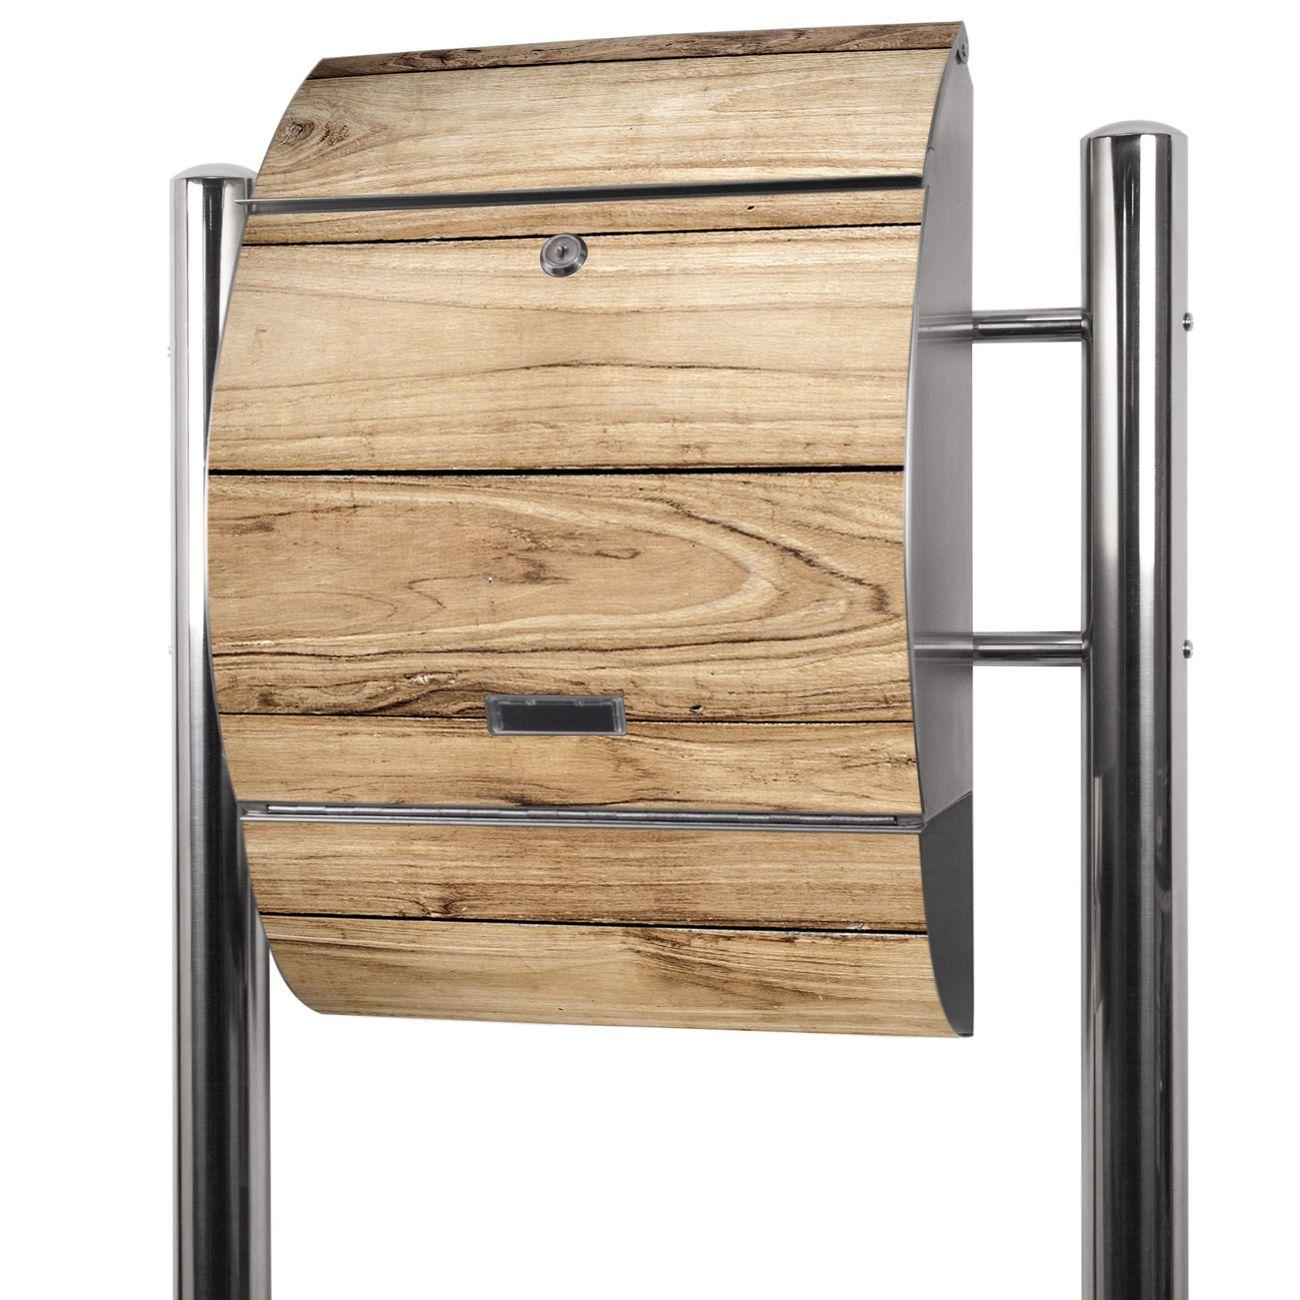 Edelstahl Standbriefkasten Holzplanken